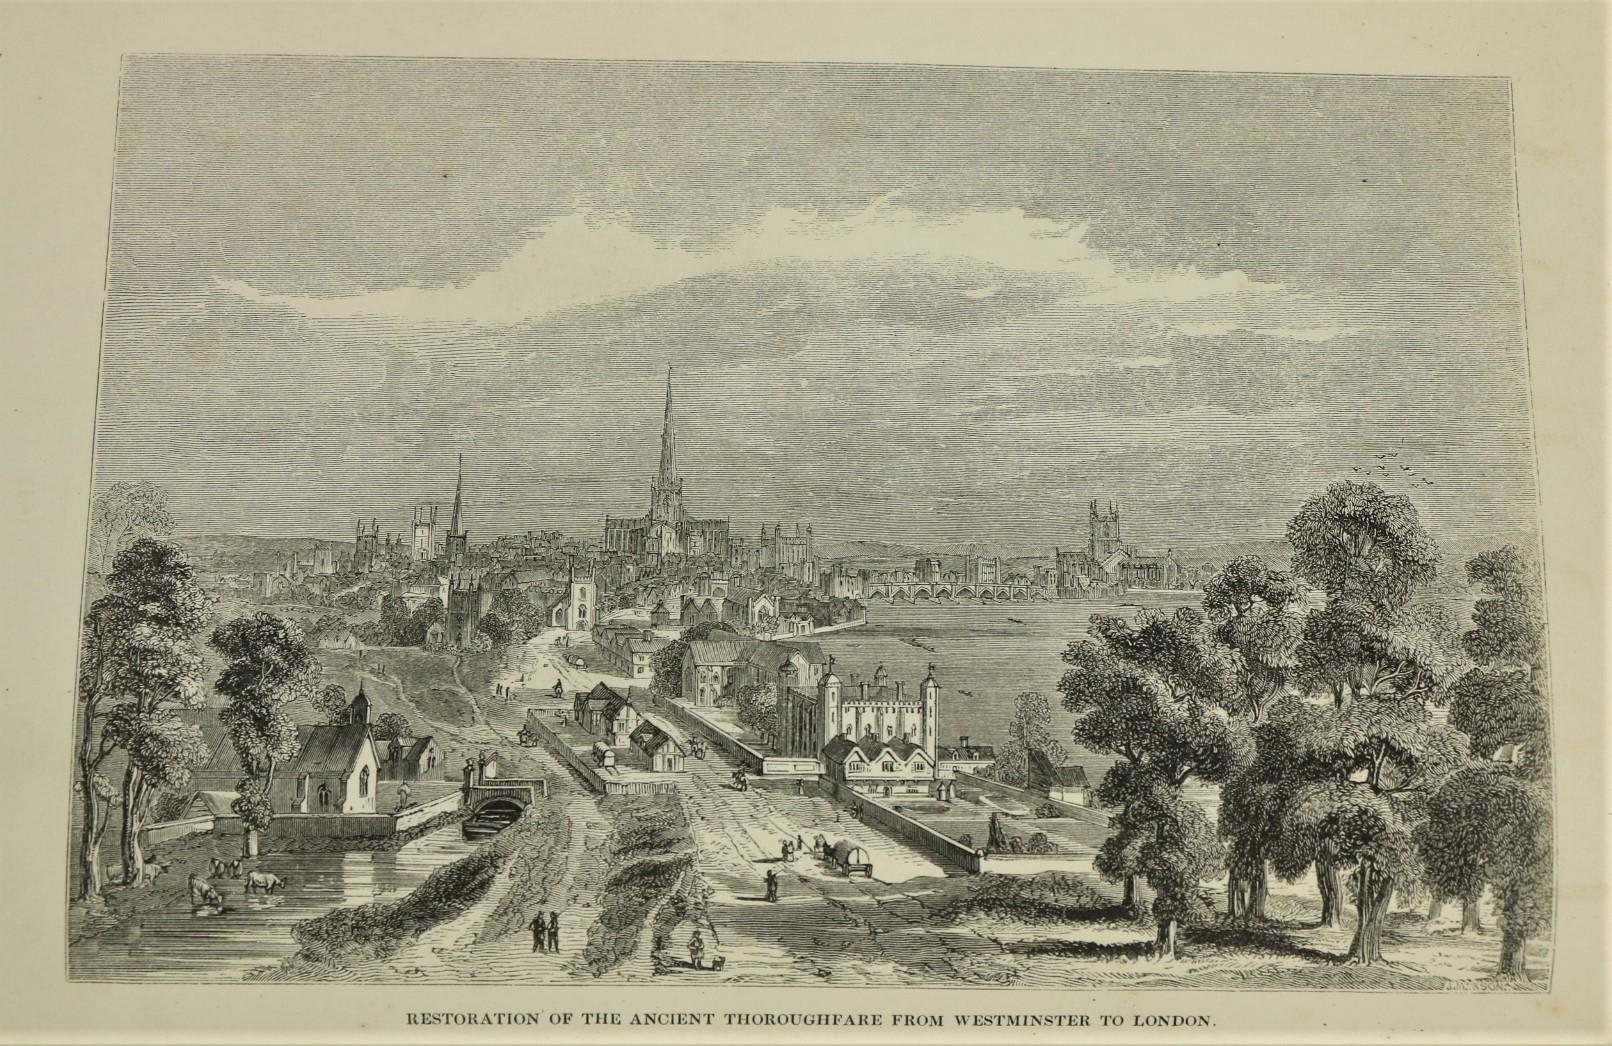 Knight (Chas.)ed.ÿLondon, 6 vols. sm. folio London 1841 - 1844. Illus. thro.-out, cont. hf. calf - Image 3 of 3